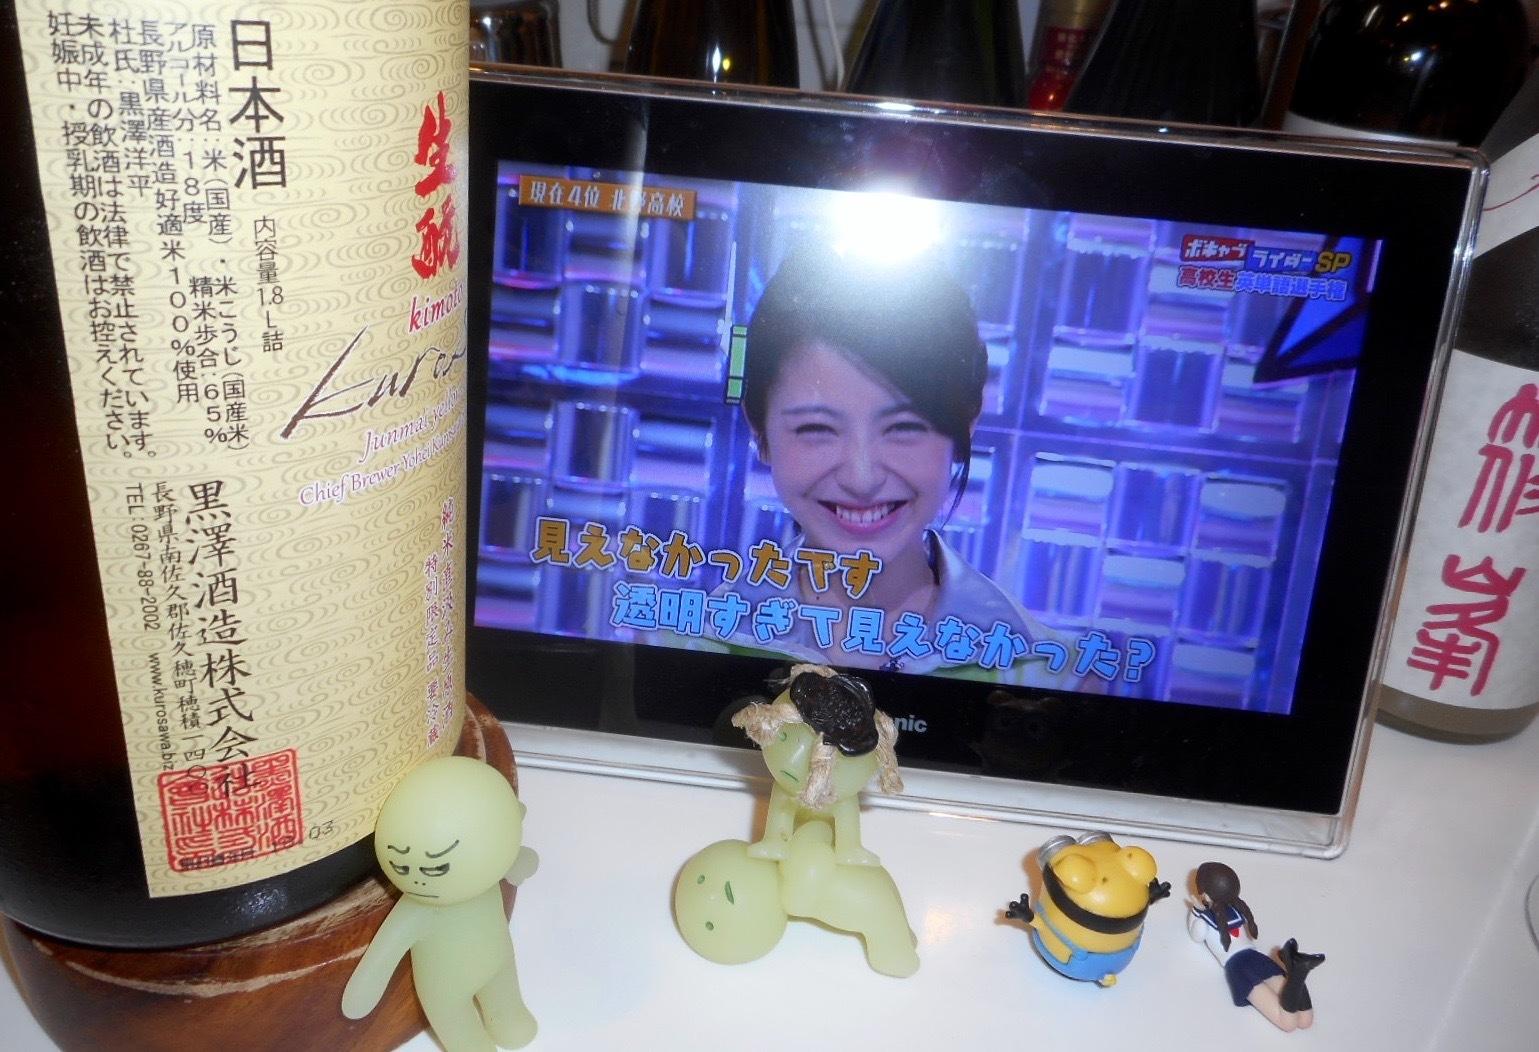 kurosawa_yellow29by3_2.jpg